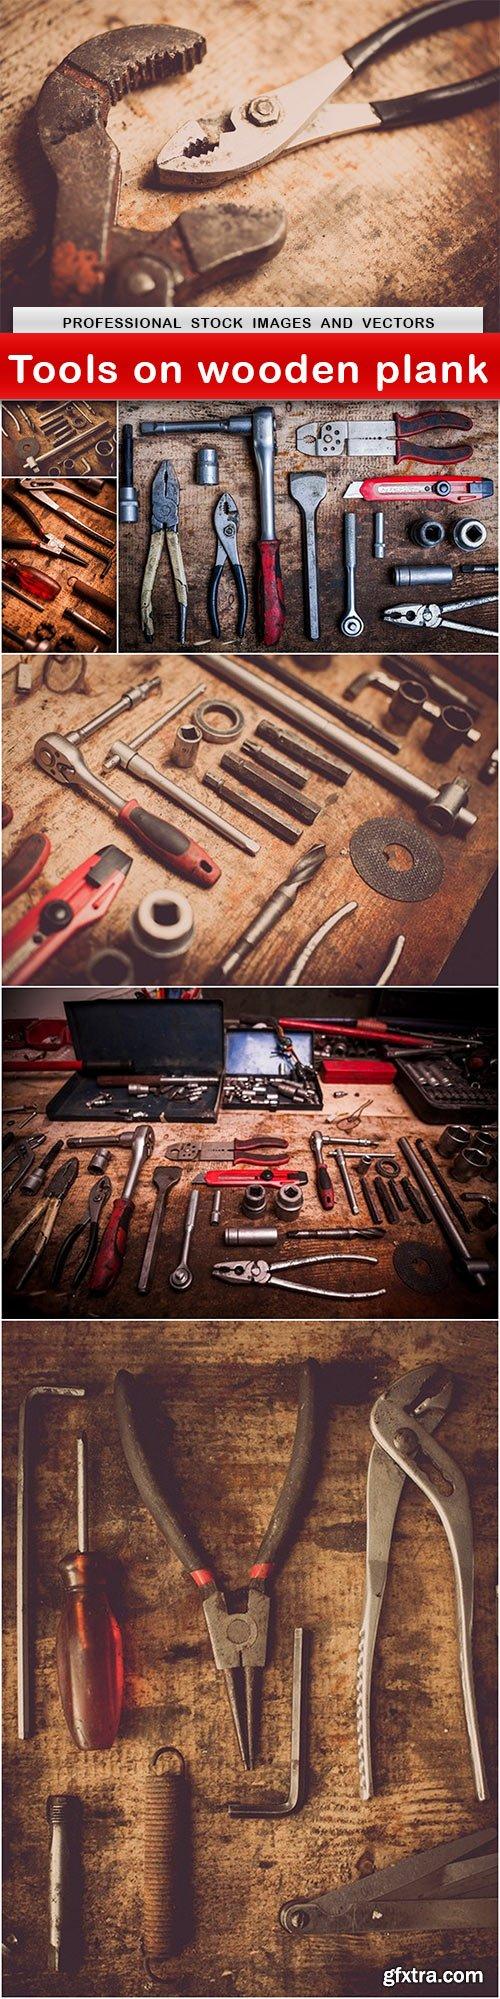 Tools on wooden plank - 7 UHQ JPEG